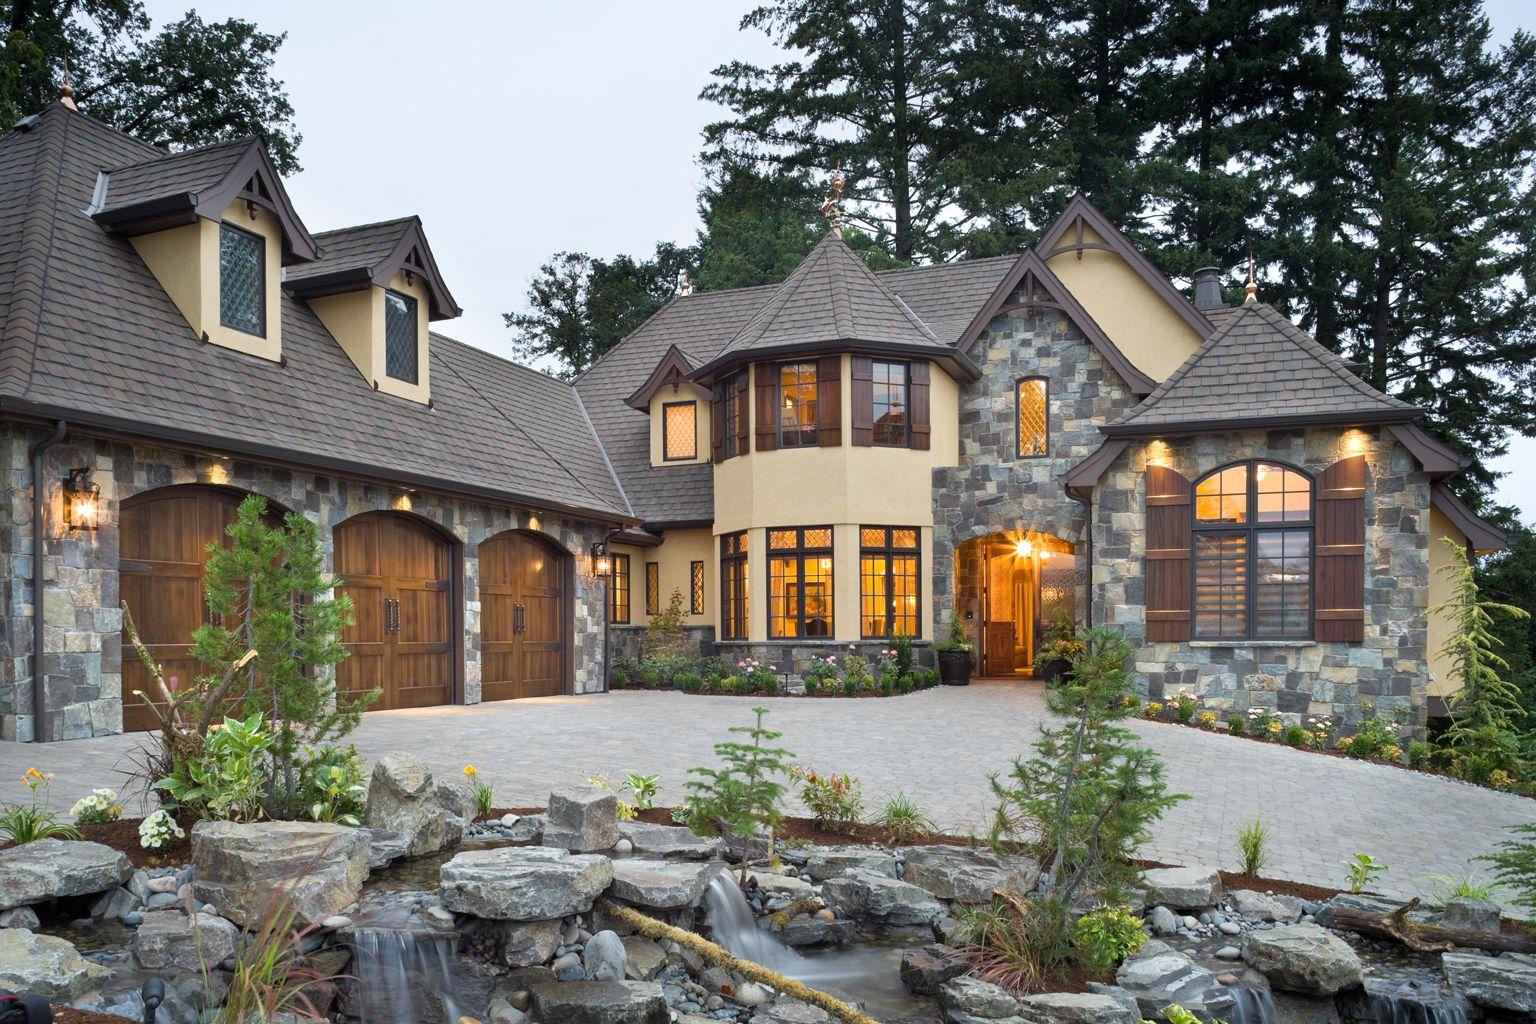 U0027Rivendell Manoru0027 By BC Custom Homes Represents Mascordu0027s Portland Street  Of Dreams Home Design